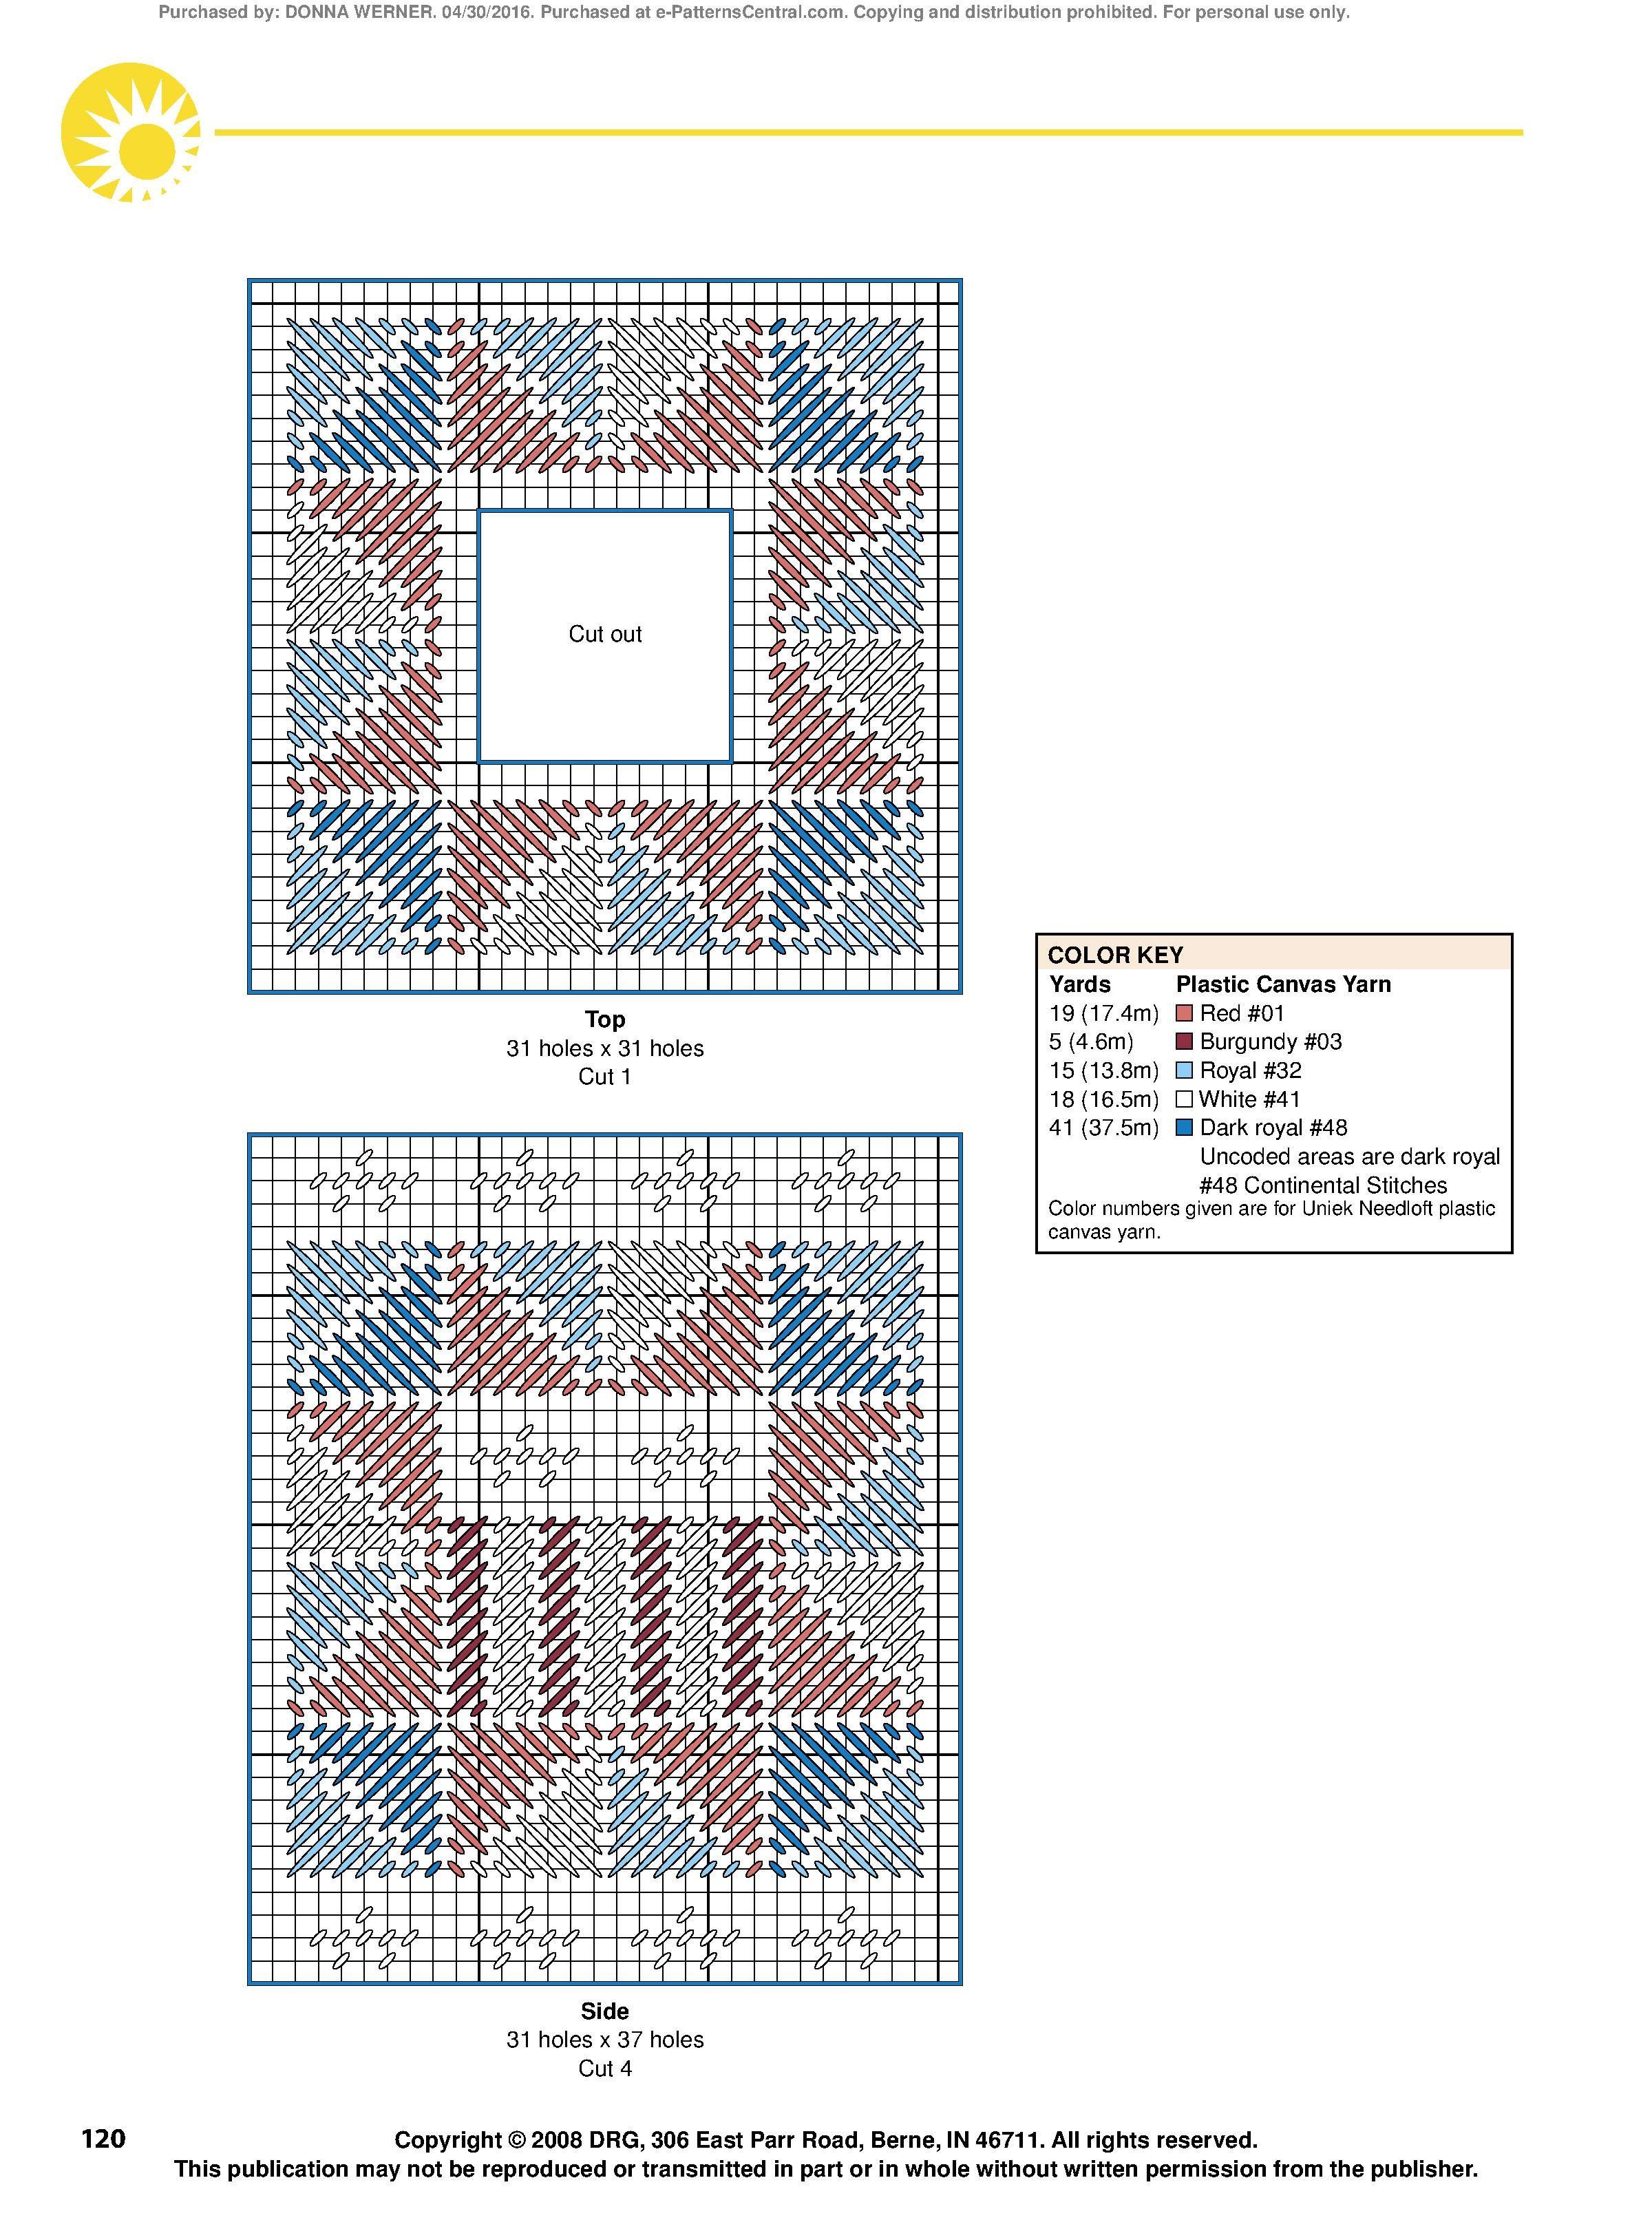 Patriotic Quilt Tissue Topper Pg 2/2 by Angie Arickx | Patriotic ...